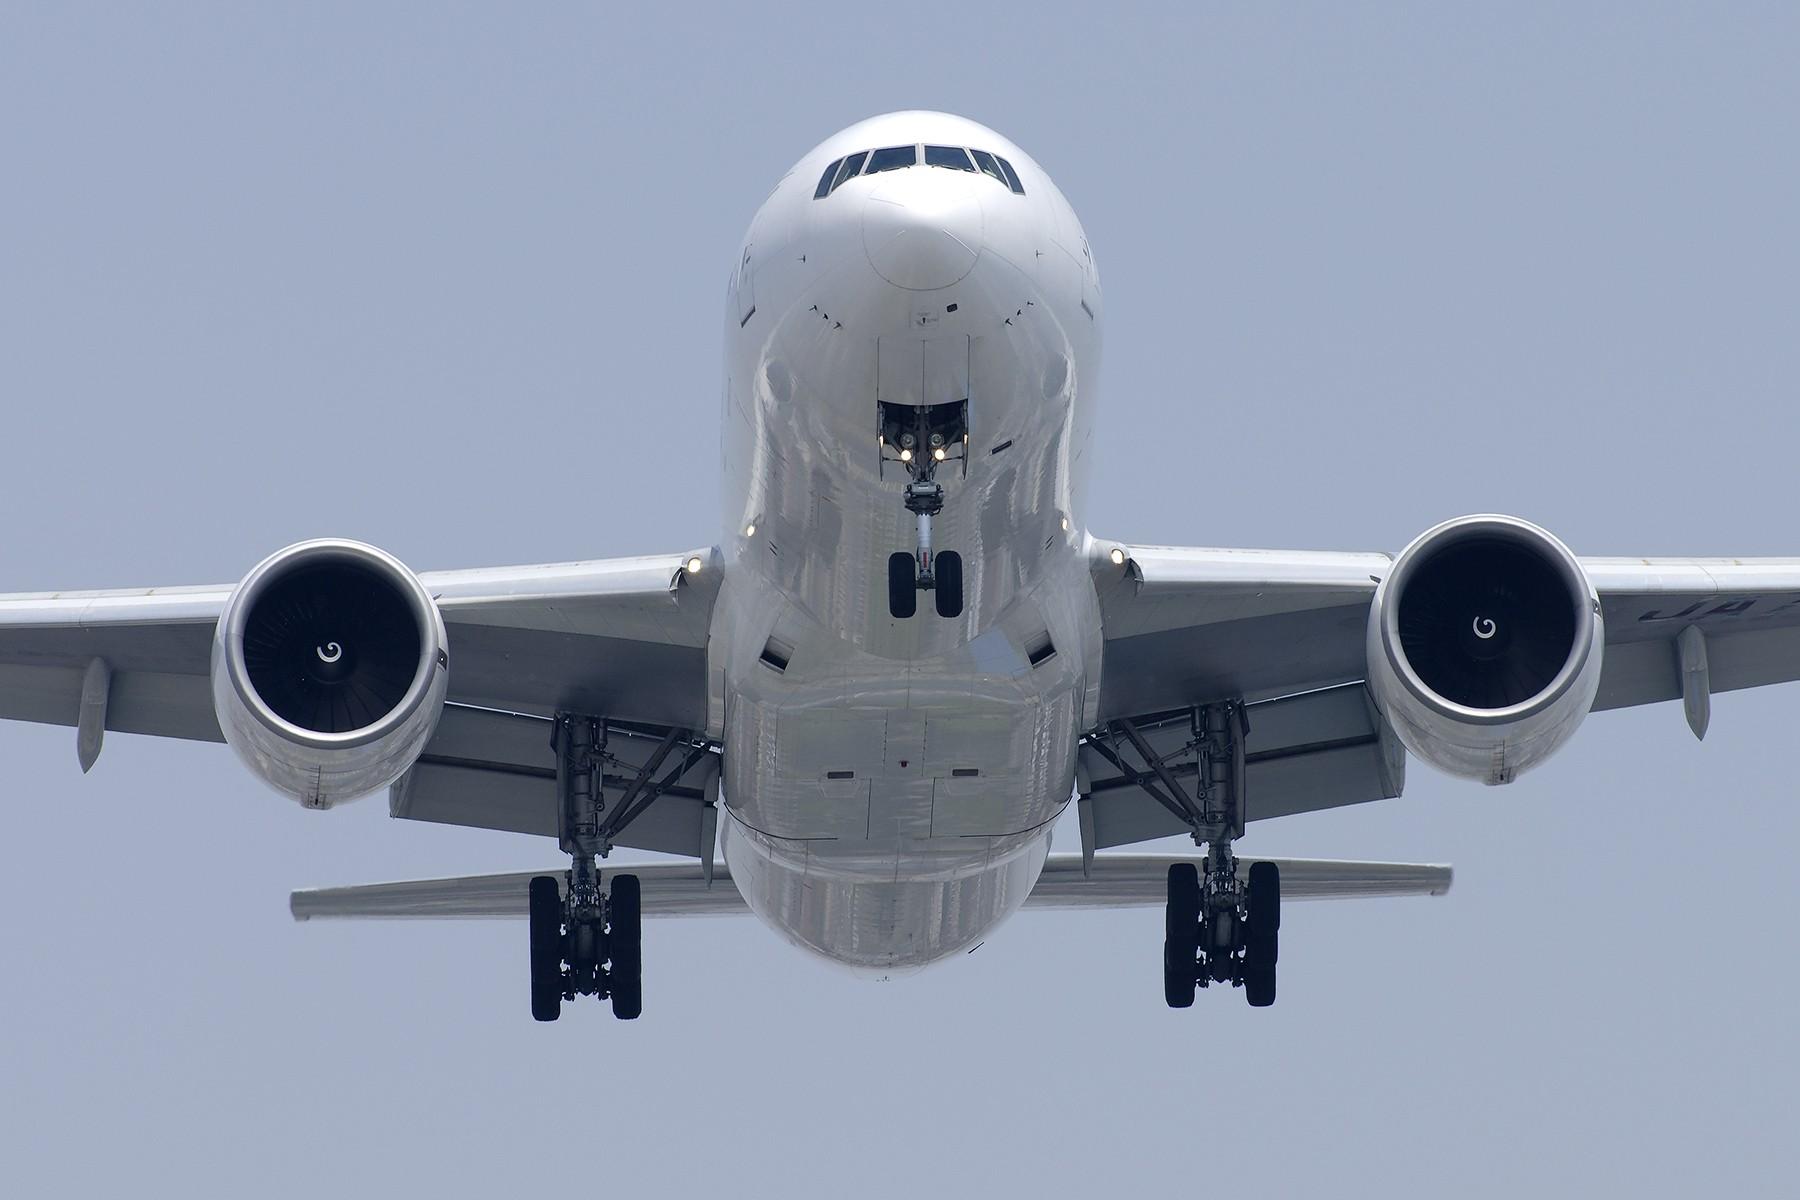 Re:[原创][原创]【SHA拍机*1800大图】4月拍的了,记得那天好货还挺多 BOEING 777-200 JA604J 中国上海虹桥国际机场